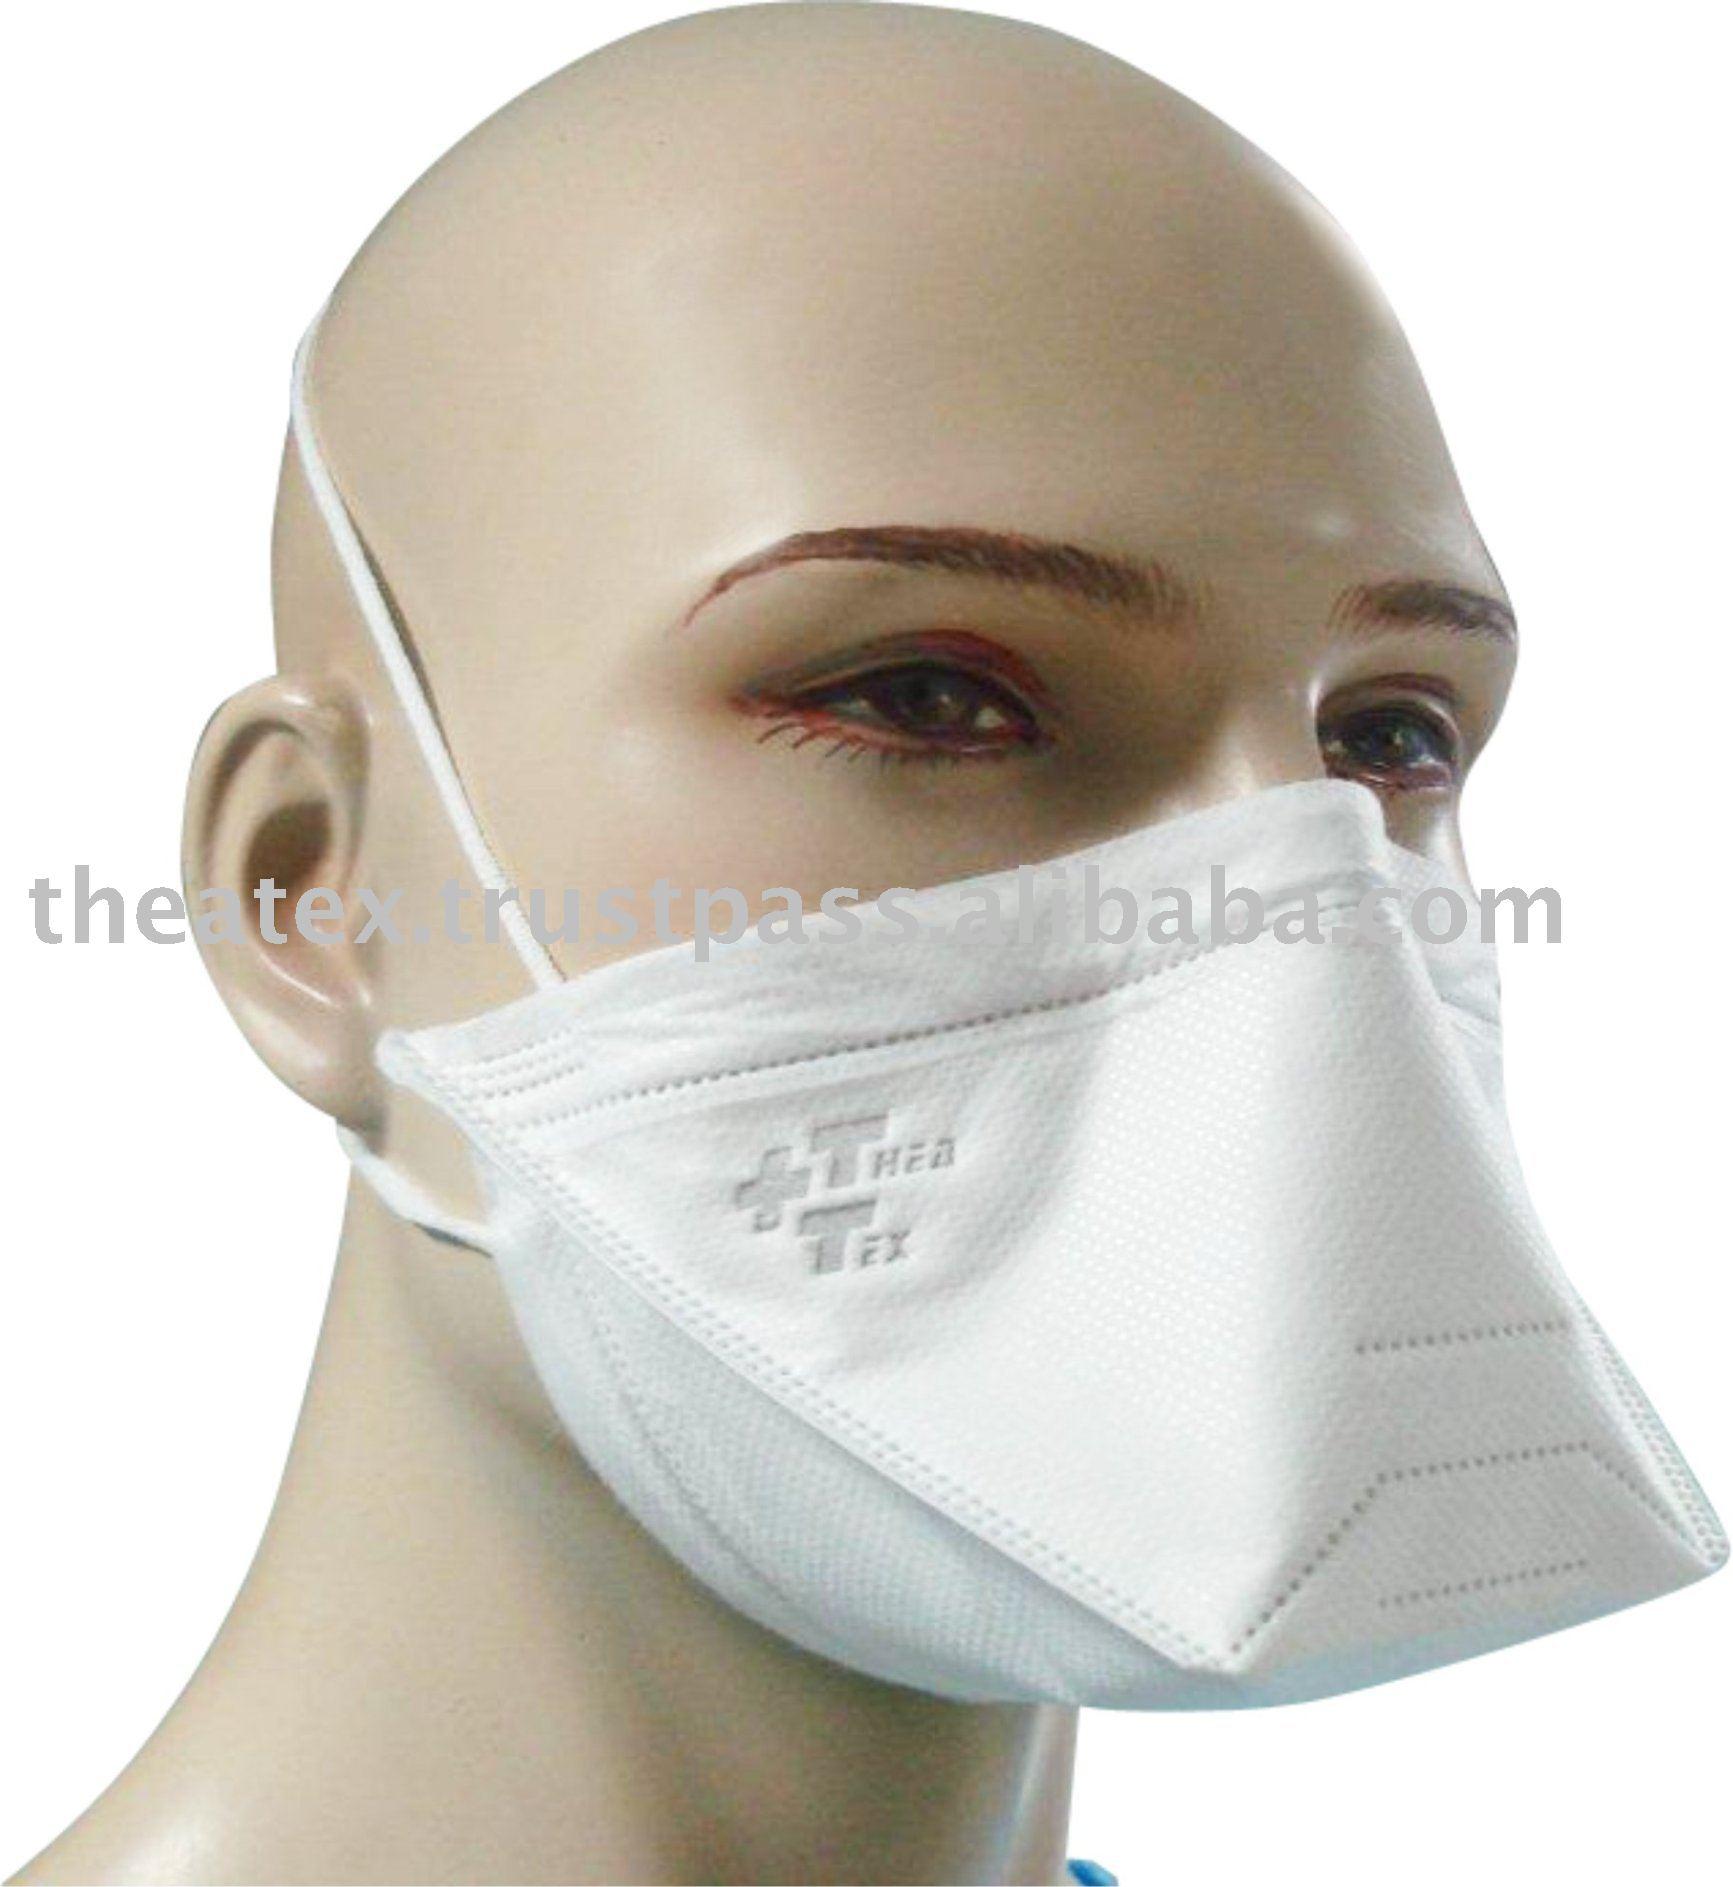 n95 Product Alibaba Respiratore com Niosh Buy Maschera N95 - Maschera On